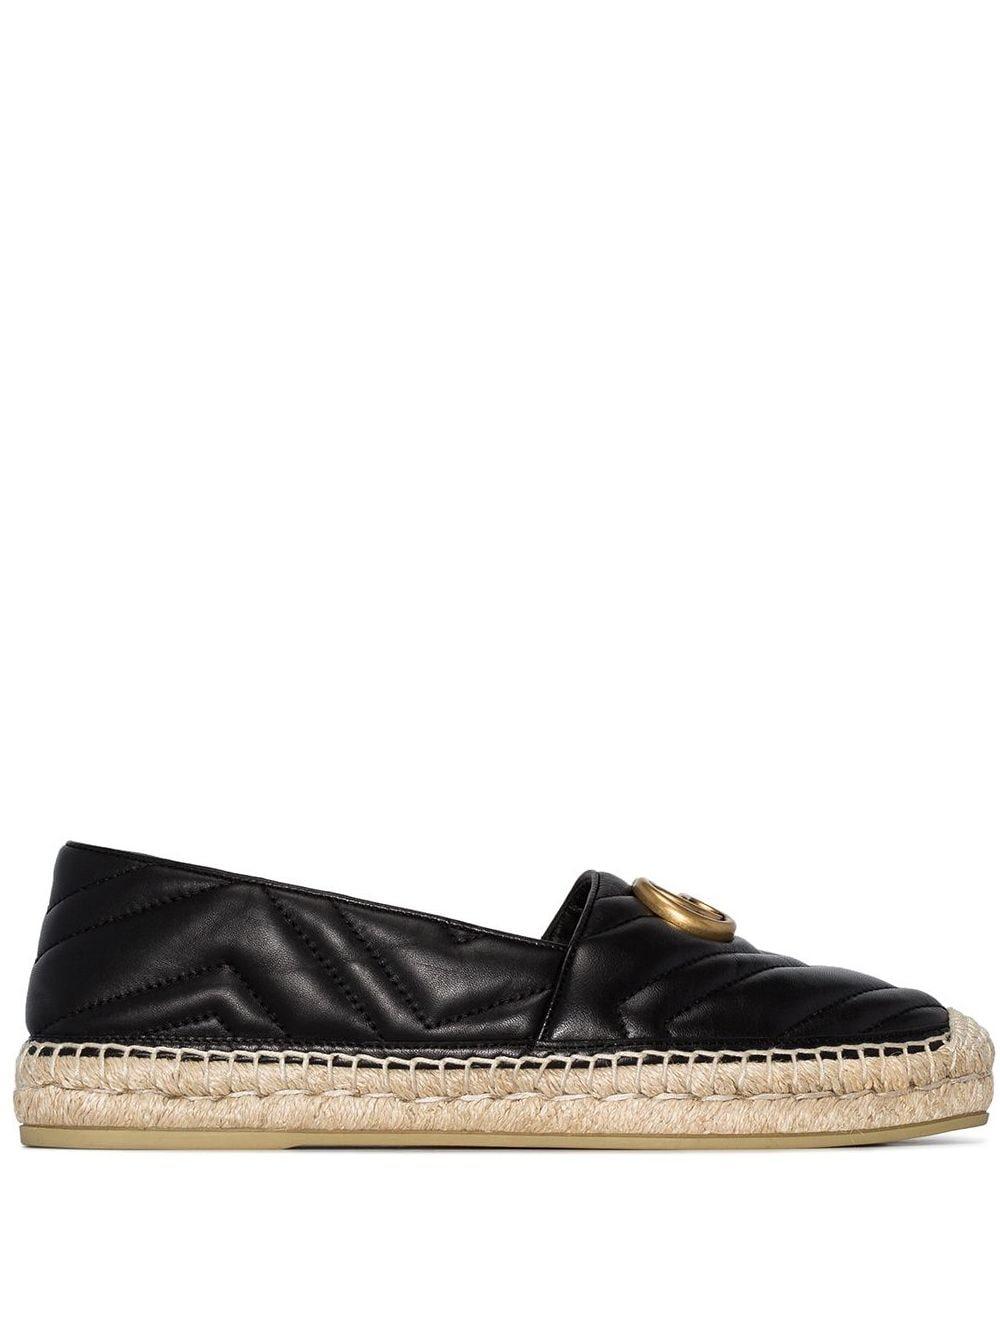 Leather Espadrillas